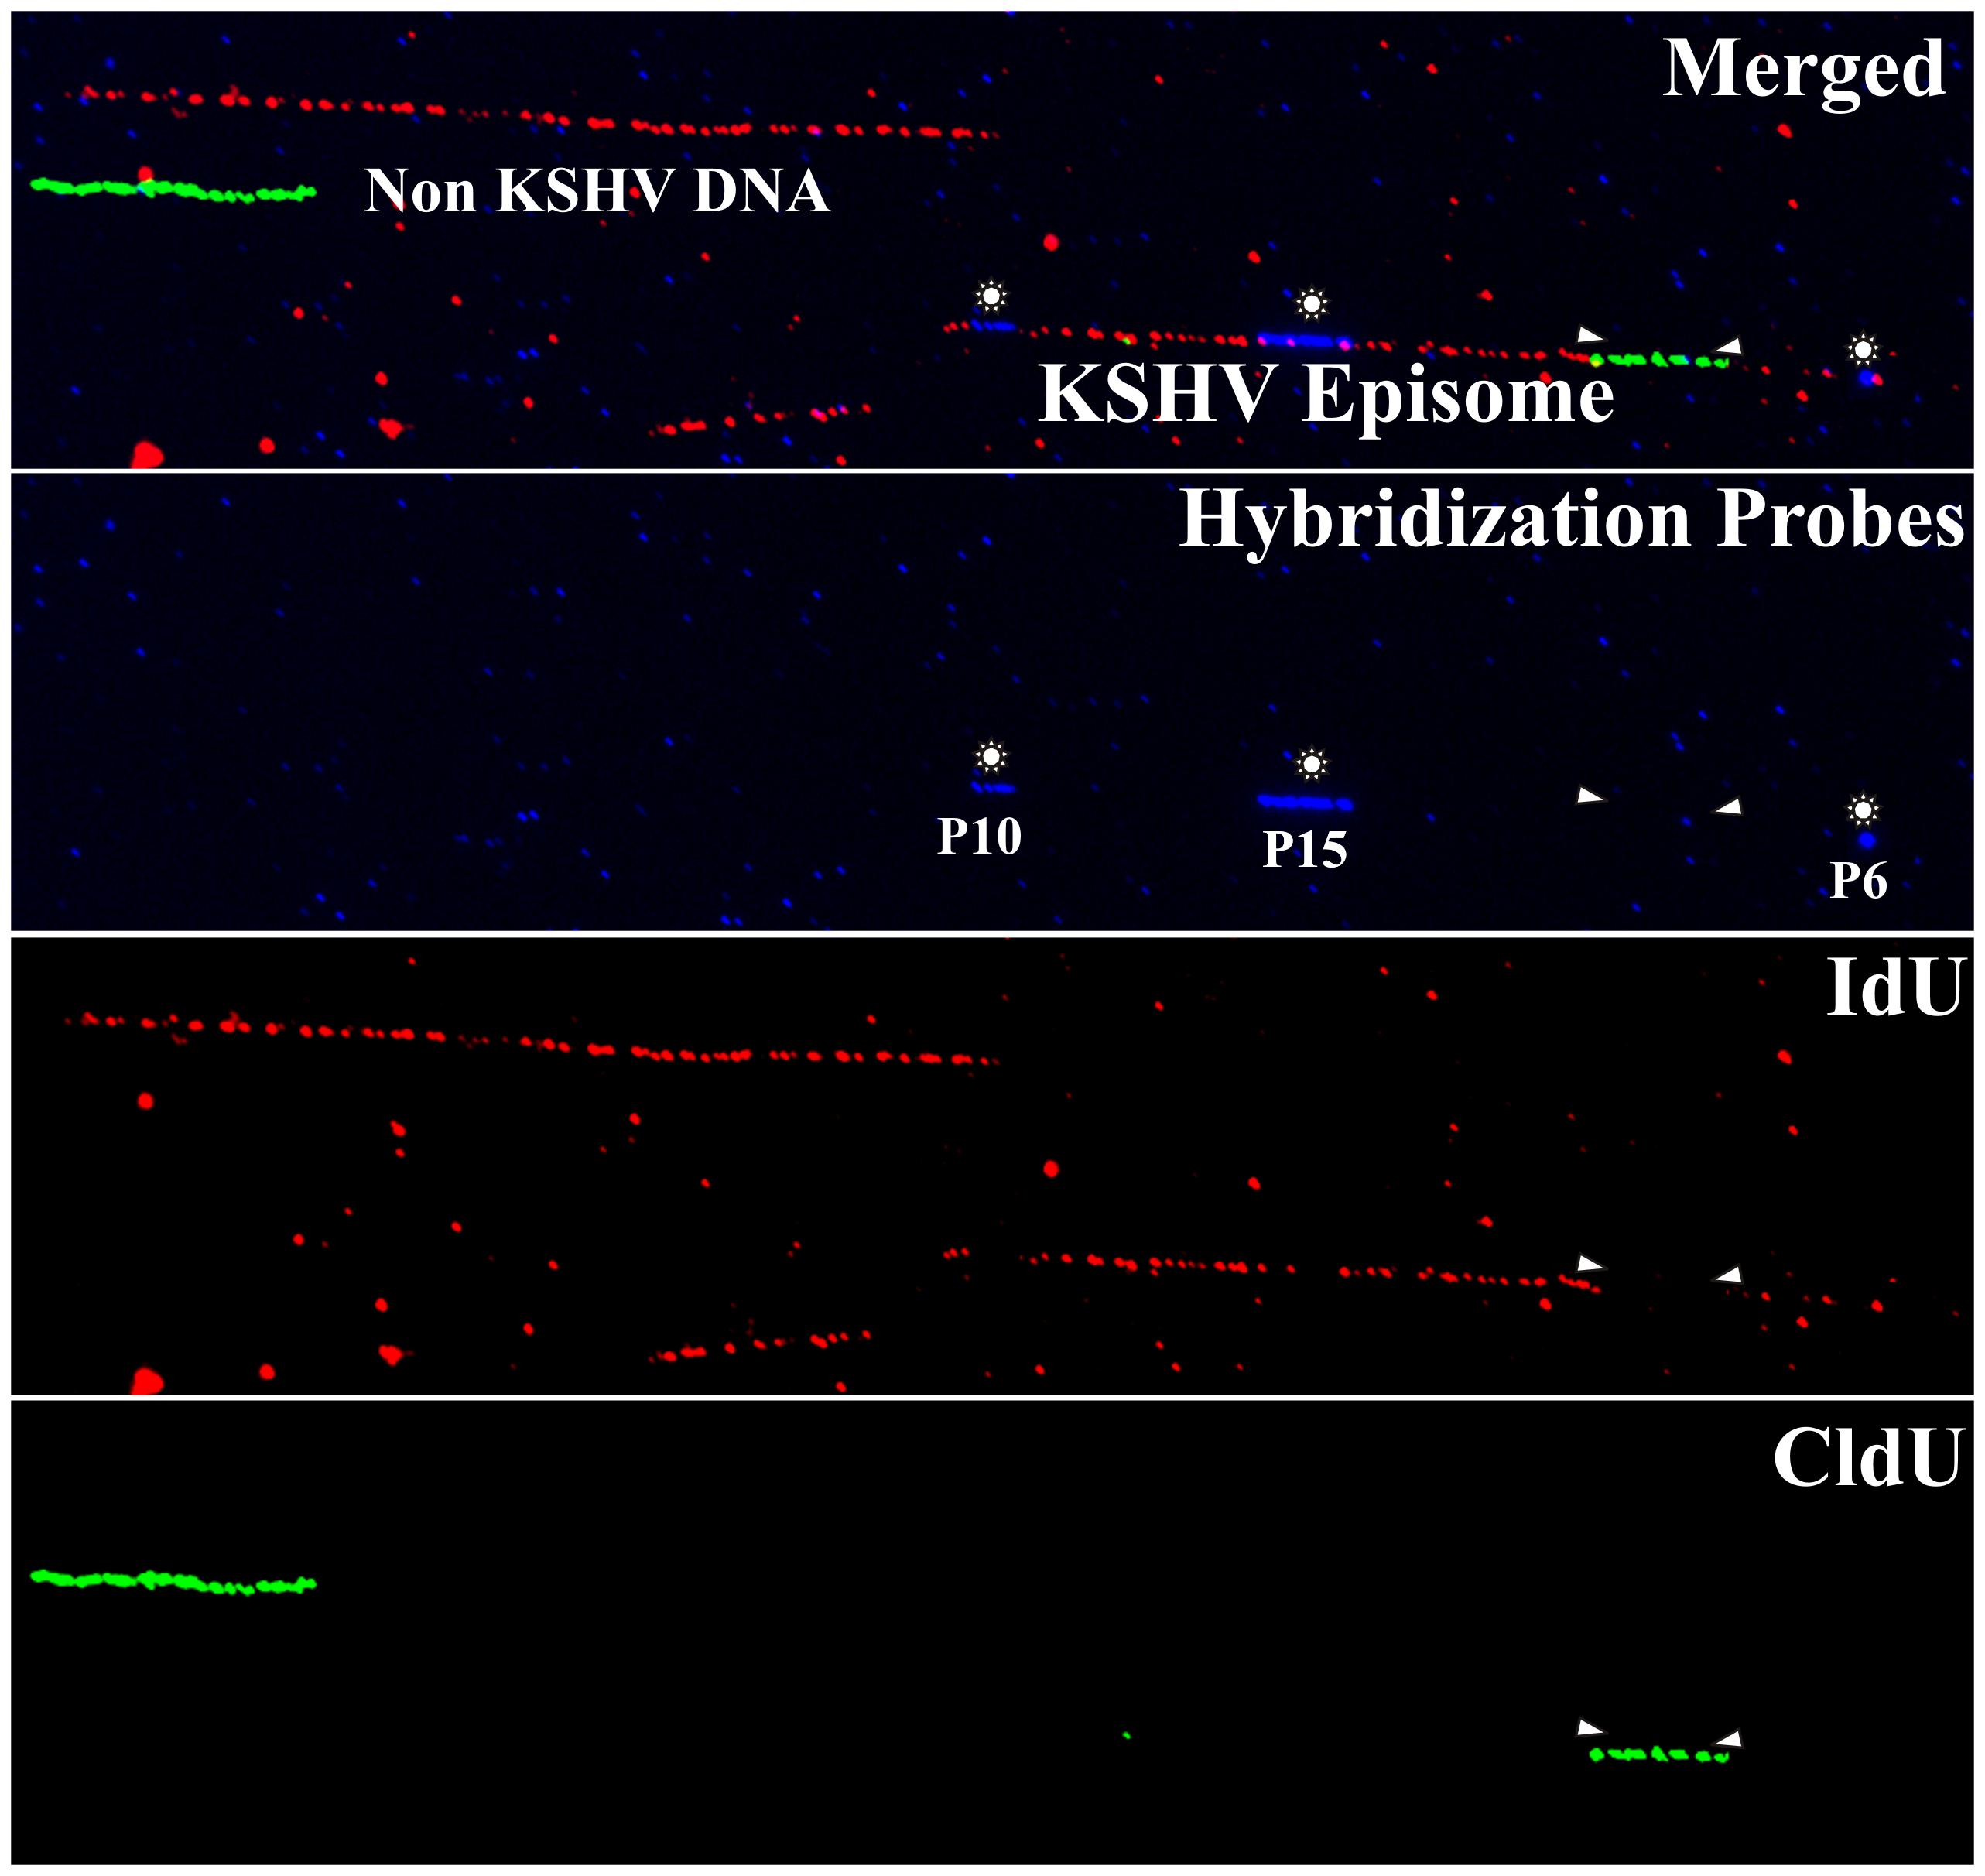 Immuno-staining and fluorescent hybridization of individual KSHV episomes.